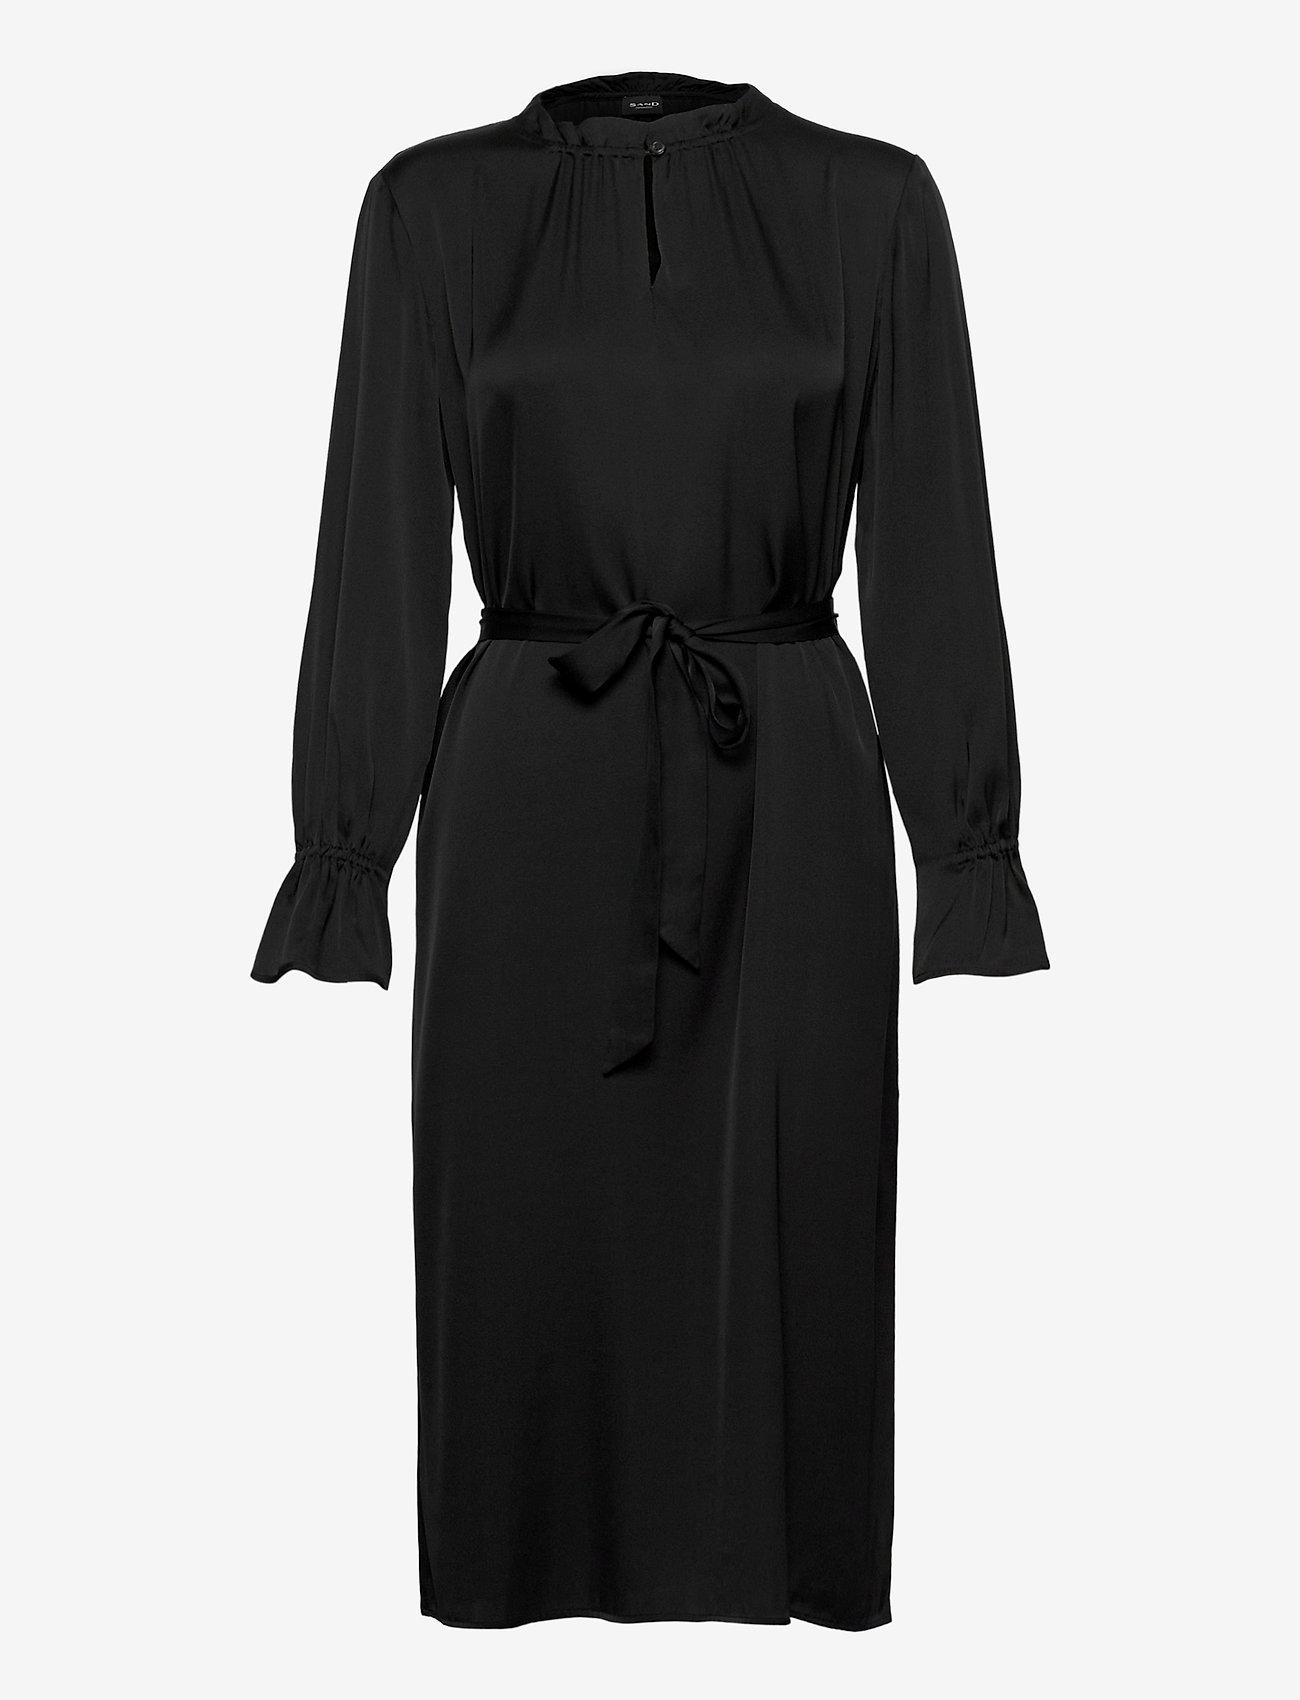 SAND - Satin Stretch - Raya FS Dress - robes midi - black - 0